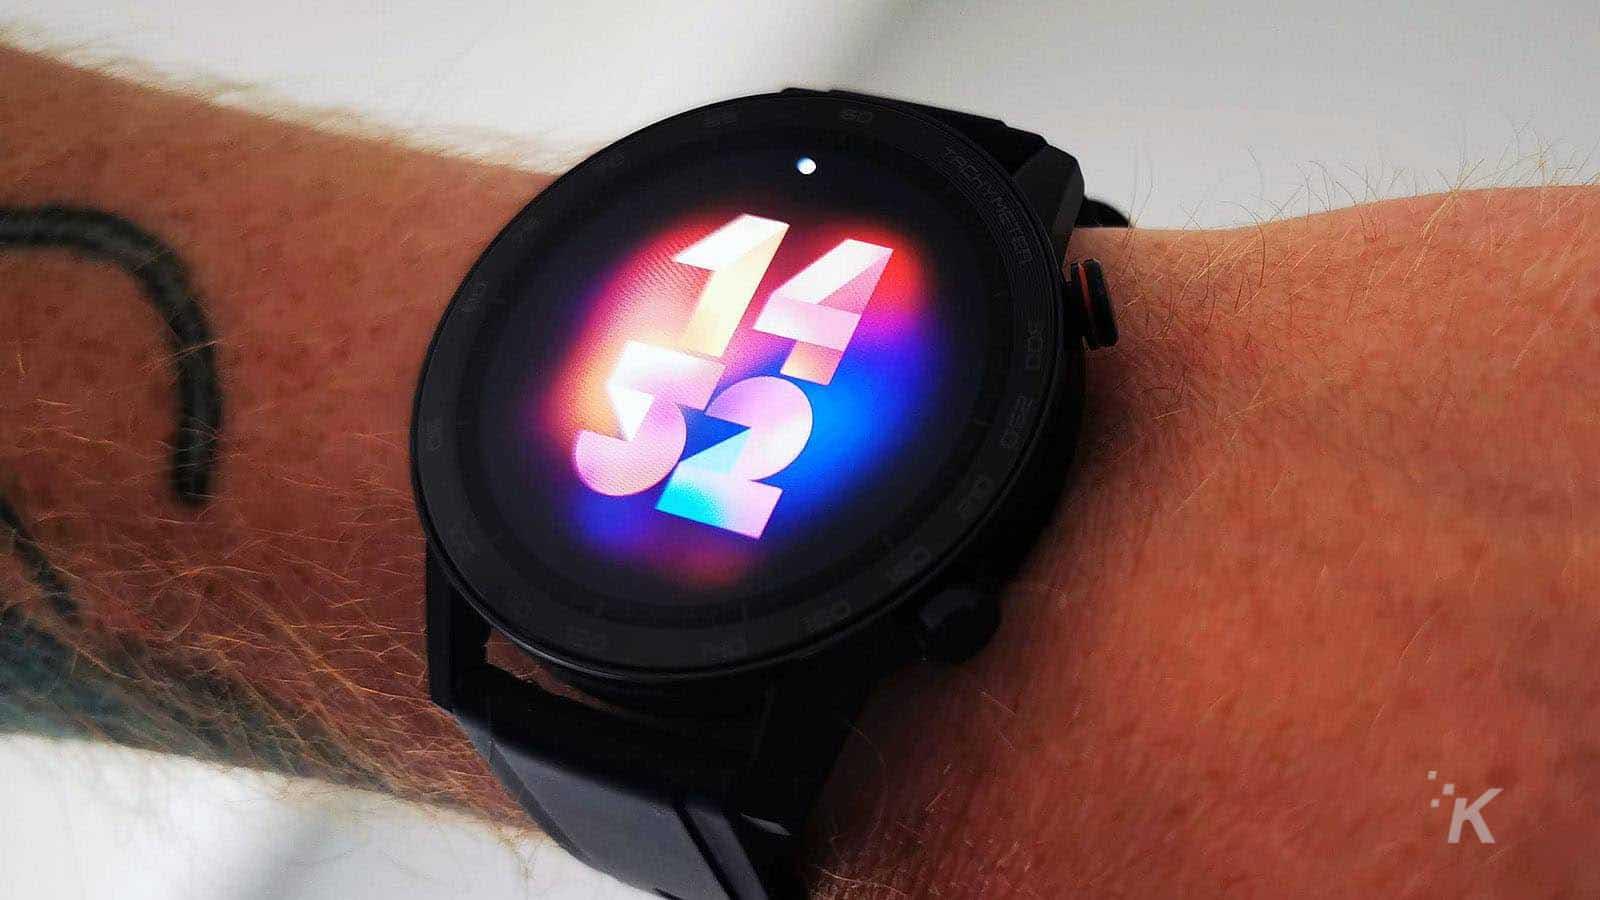 honor magic watch on wrist